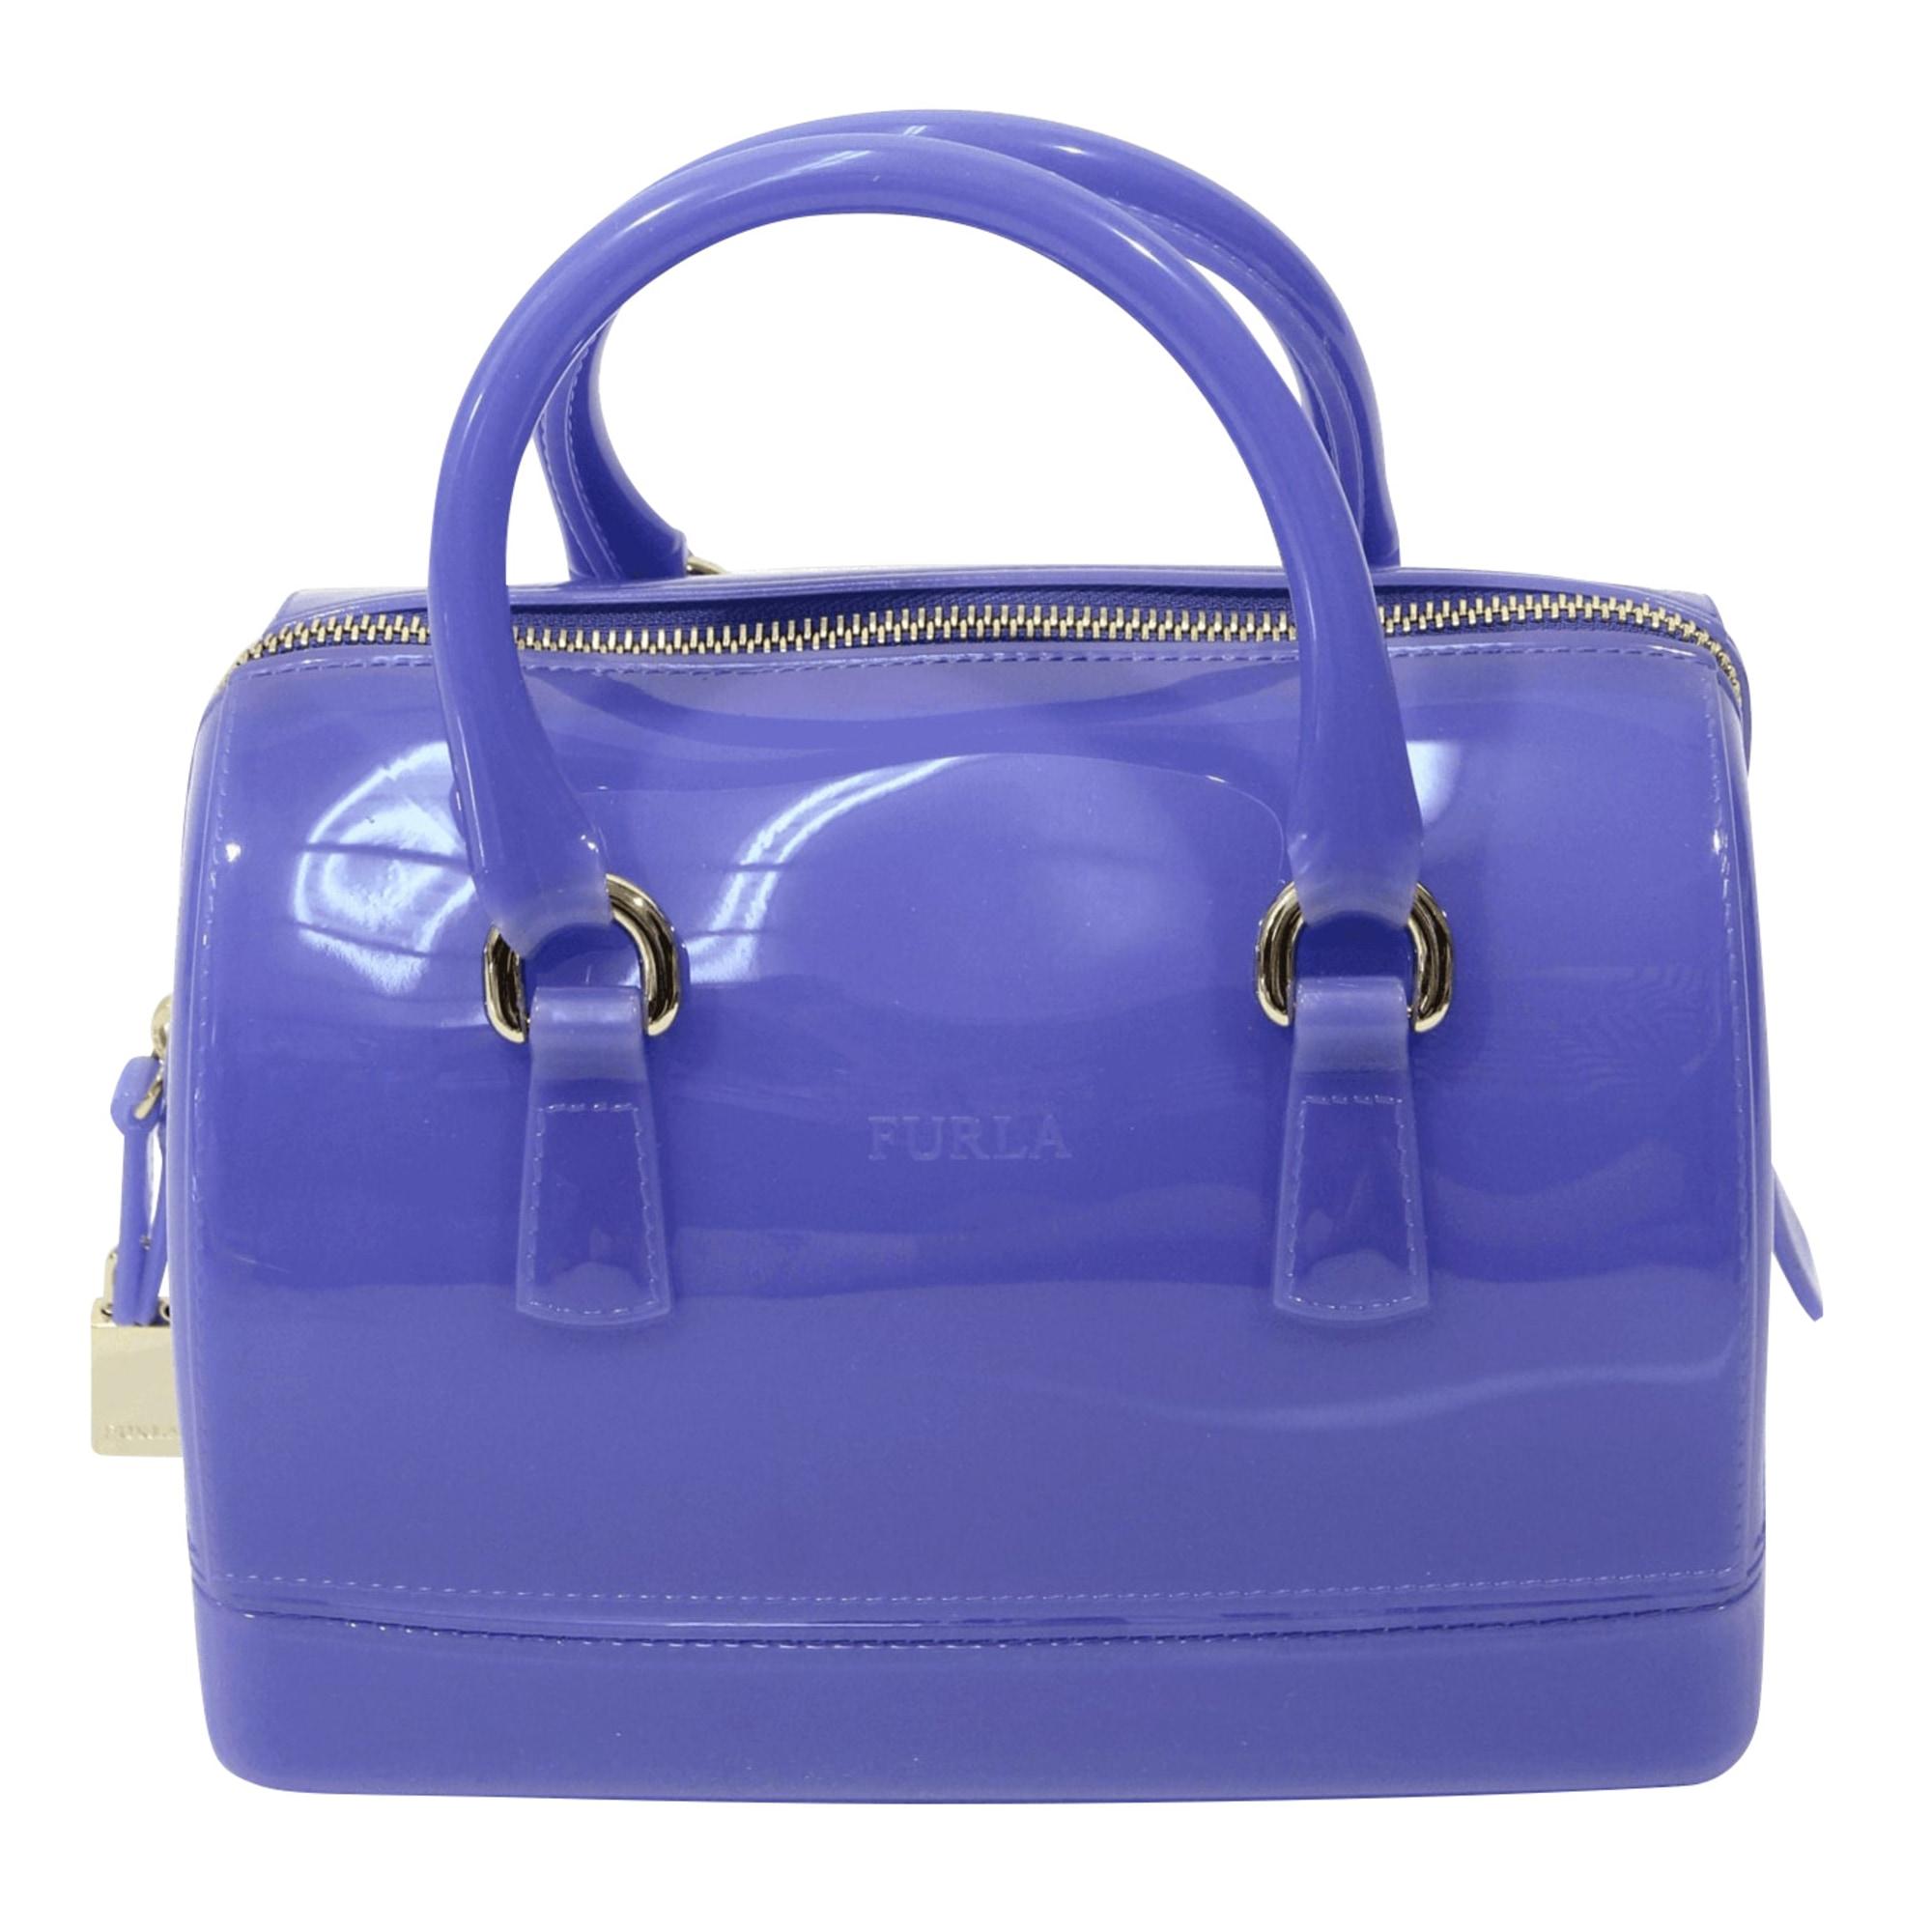 Mallette FURLA Bleu, bleu marine, bleu turquoise